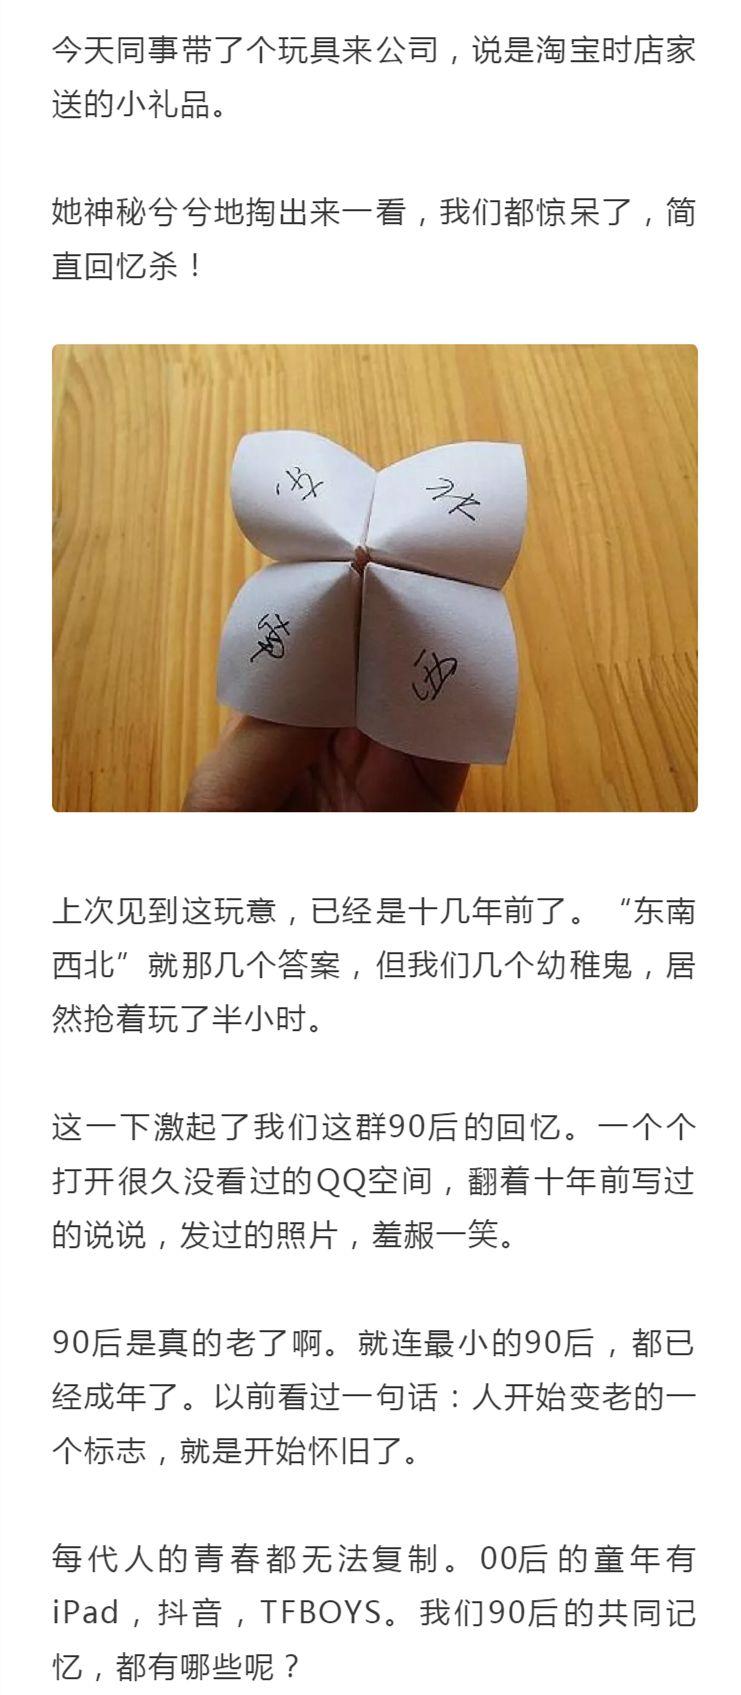 http://www.beaconitnl.com/wenhua/229542.html